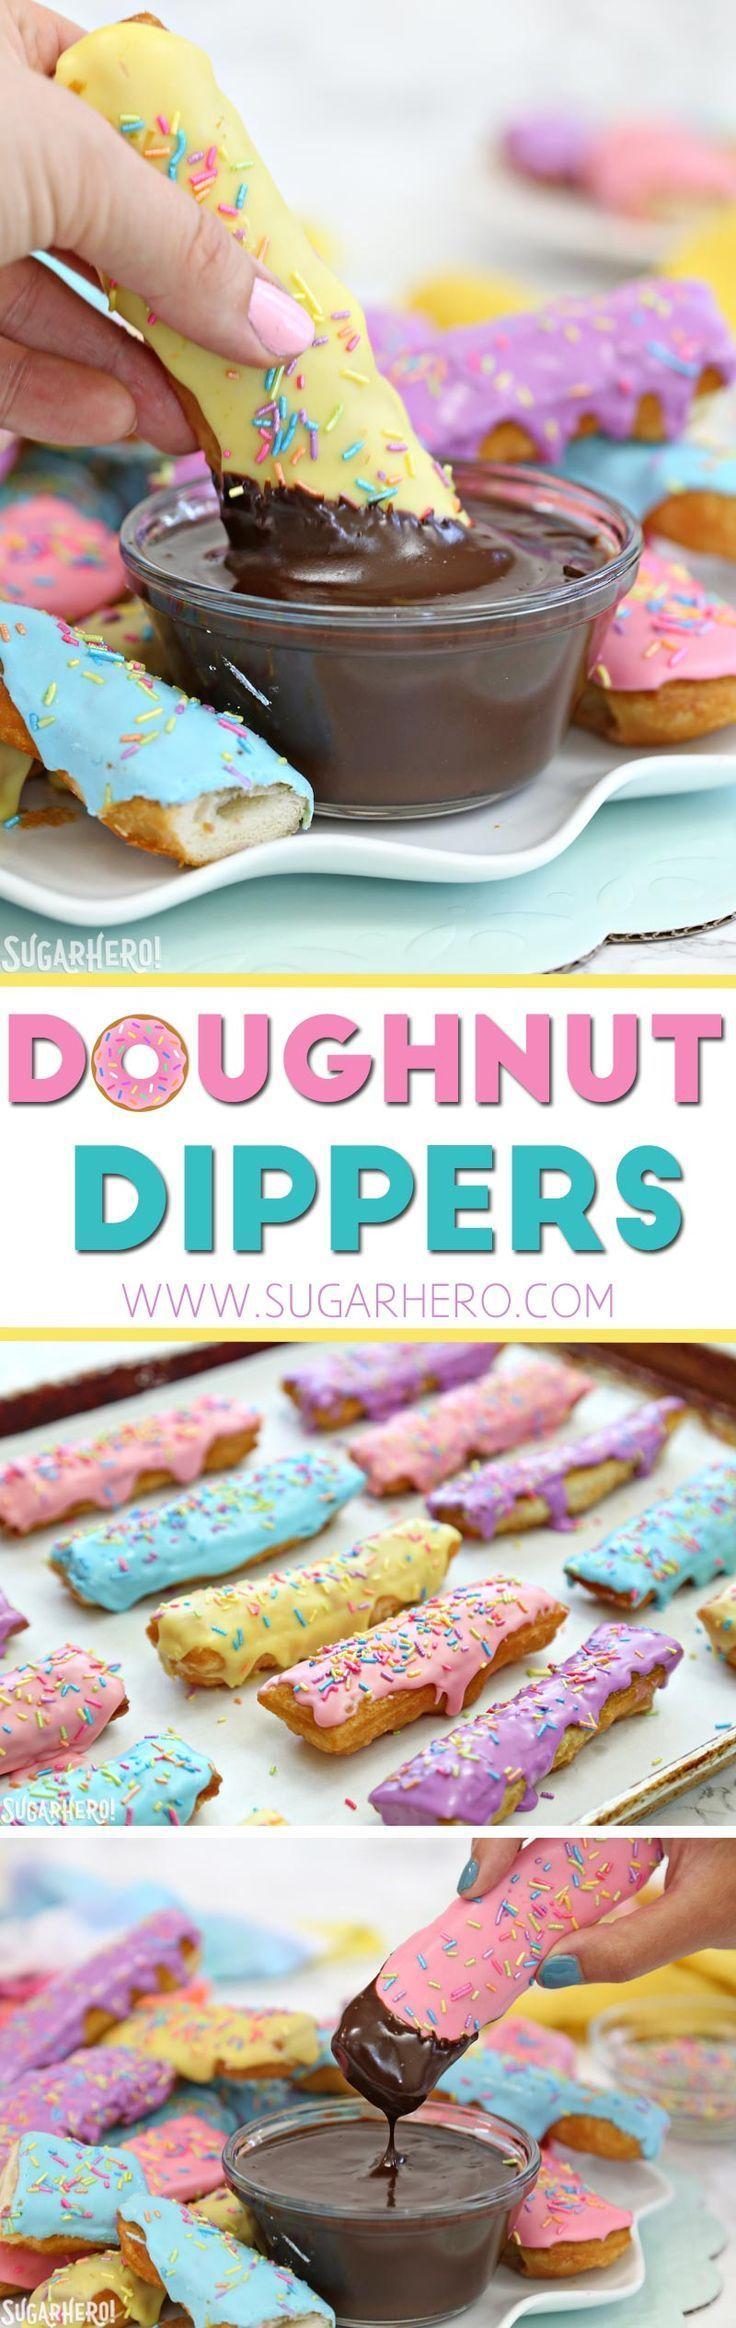 Doughnut Dippers - super easy homemade doughnuts with warm mocha sauce! | From SugarHero.com